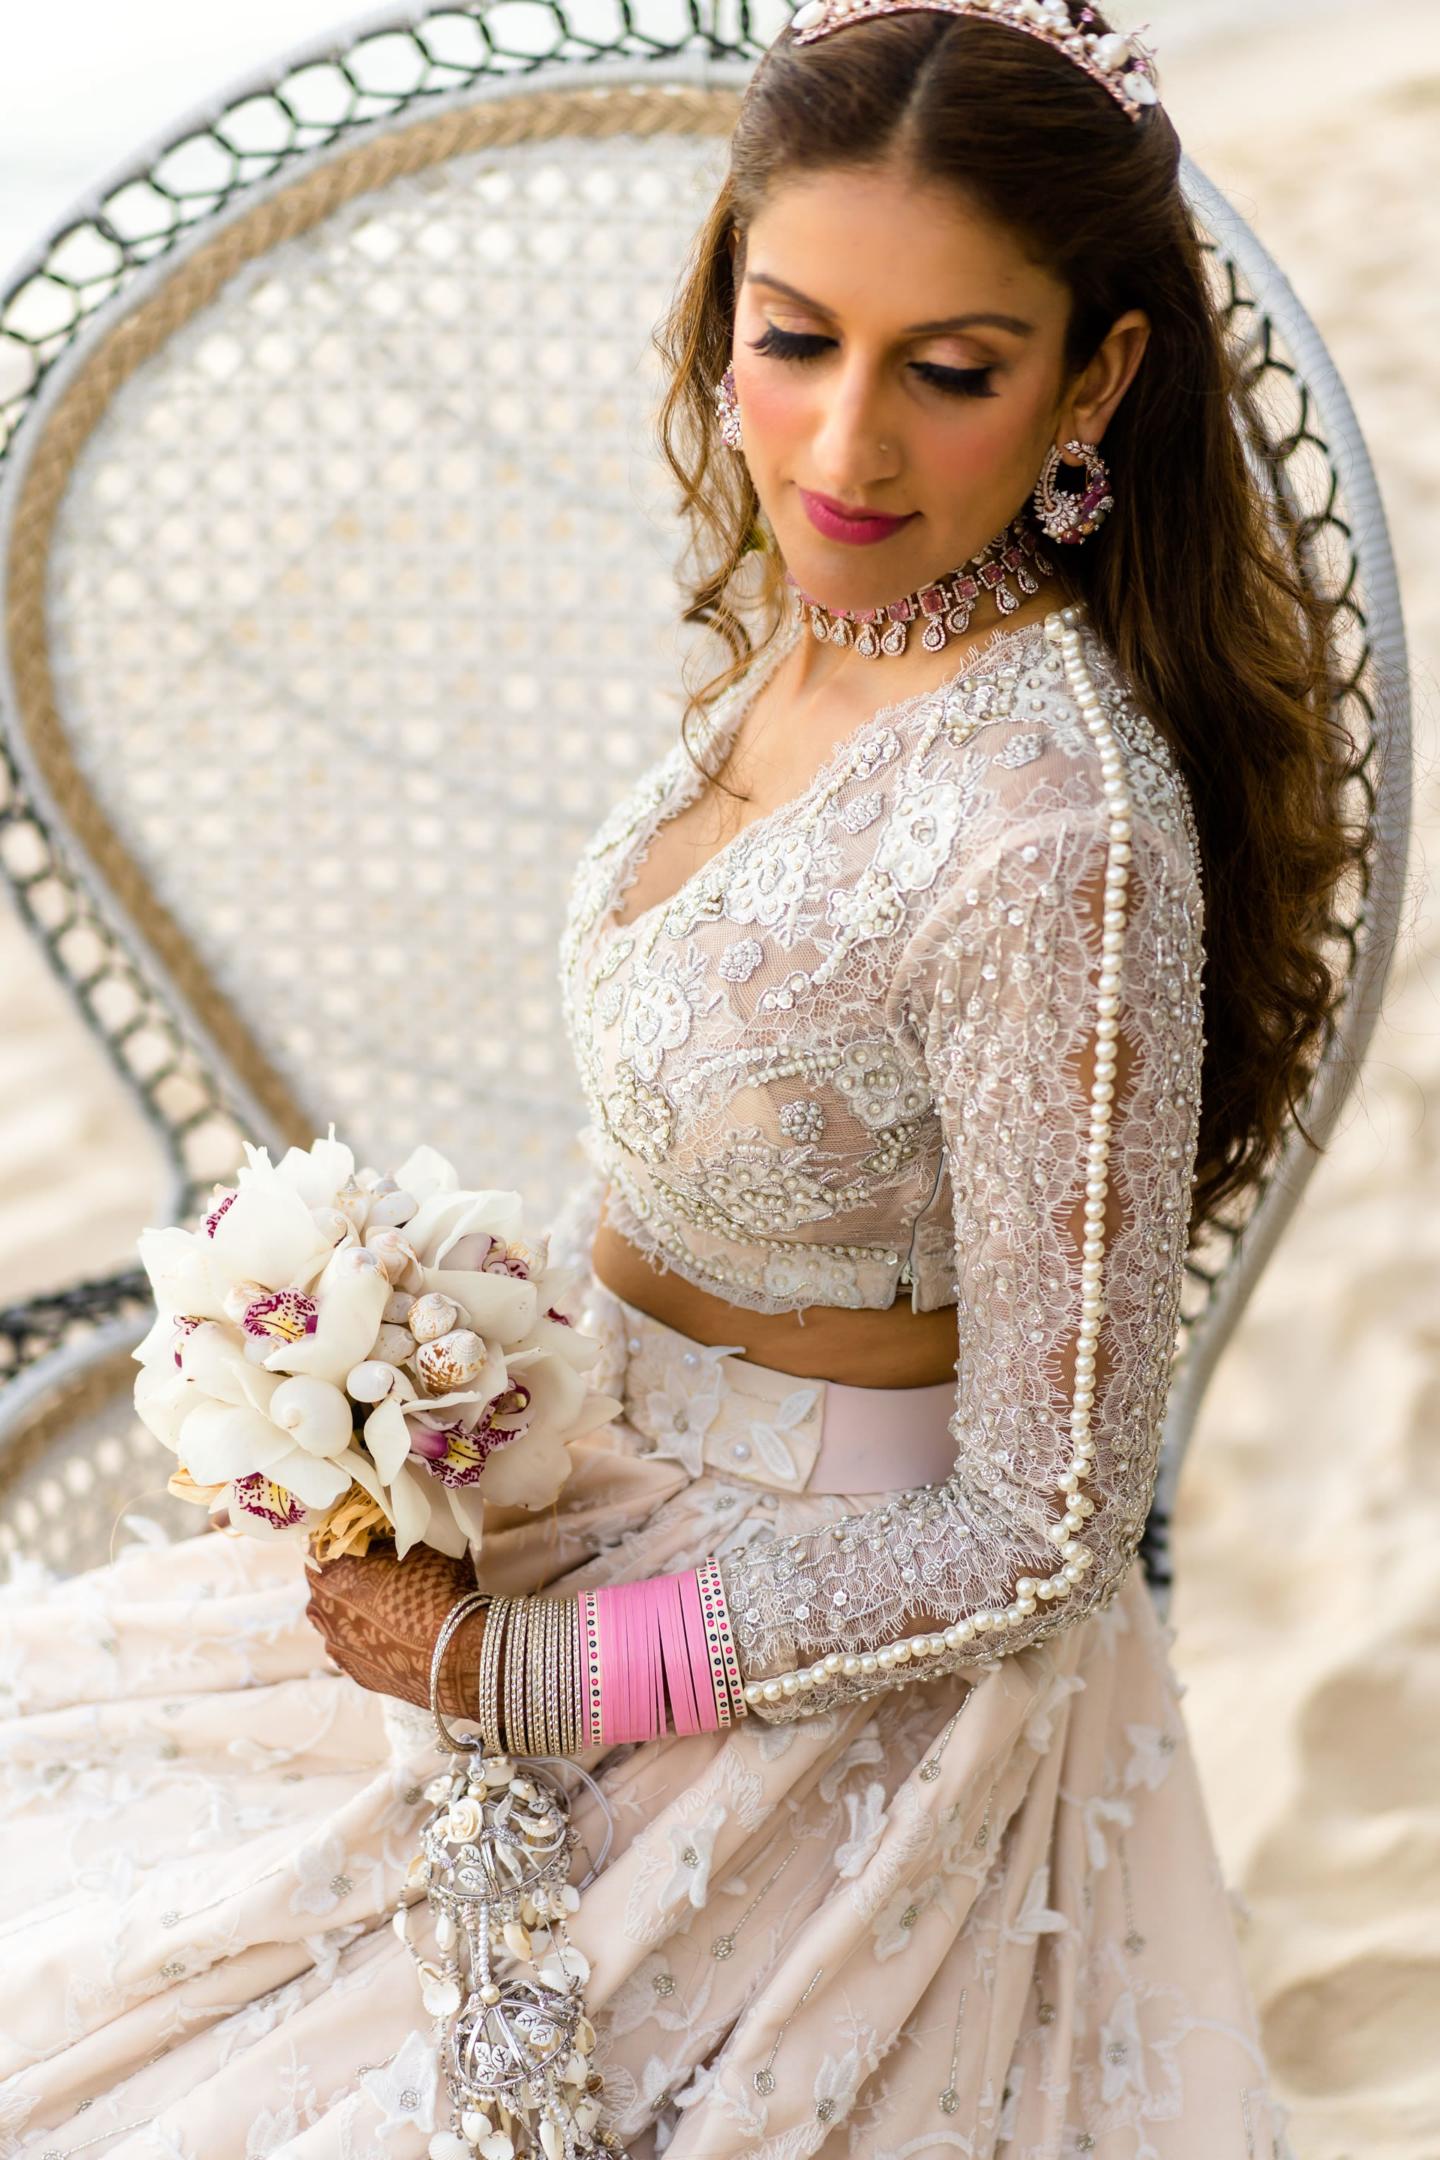 - 109 :: What an adventure: an Indian wedding in Vietnam :: Luxury wedding photography - 108 ::  - 109